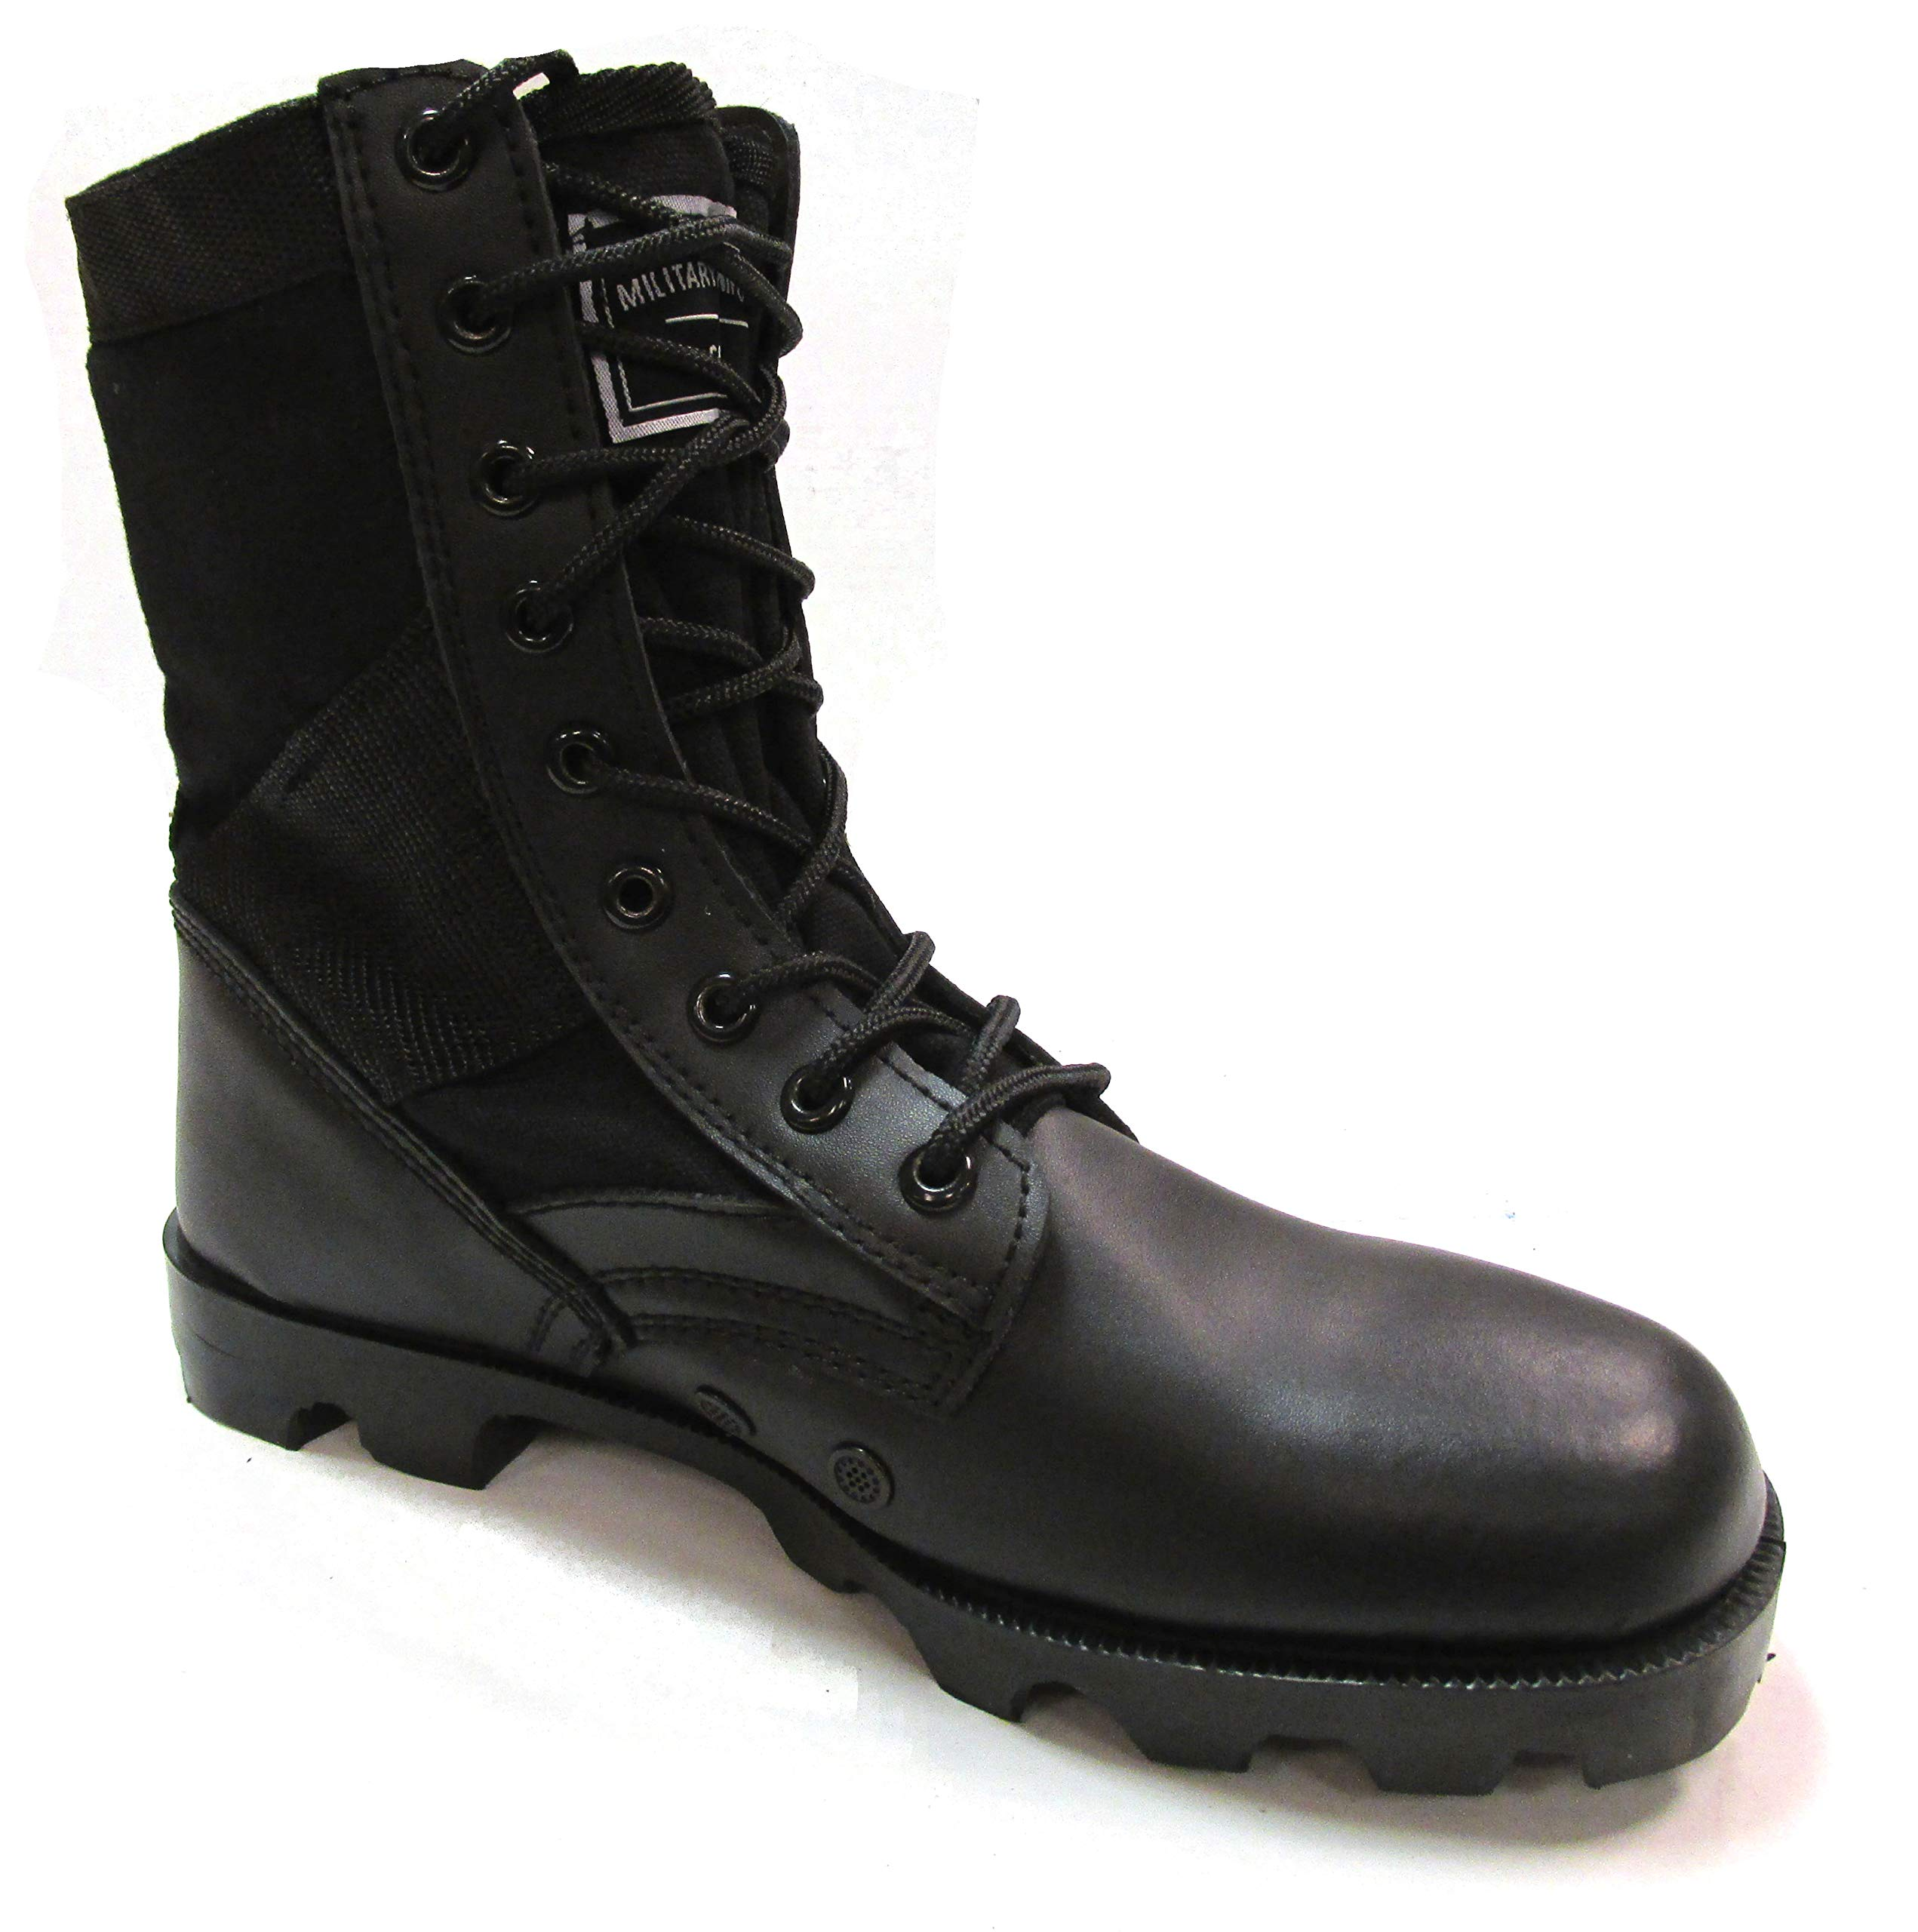 Military Uniform Supply Jungle Boots Black - 10 Regular